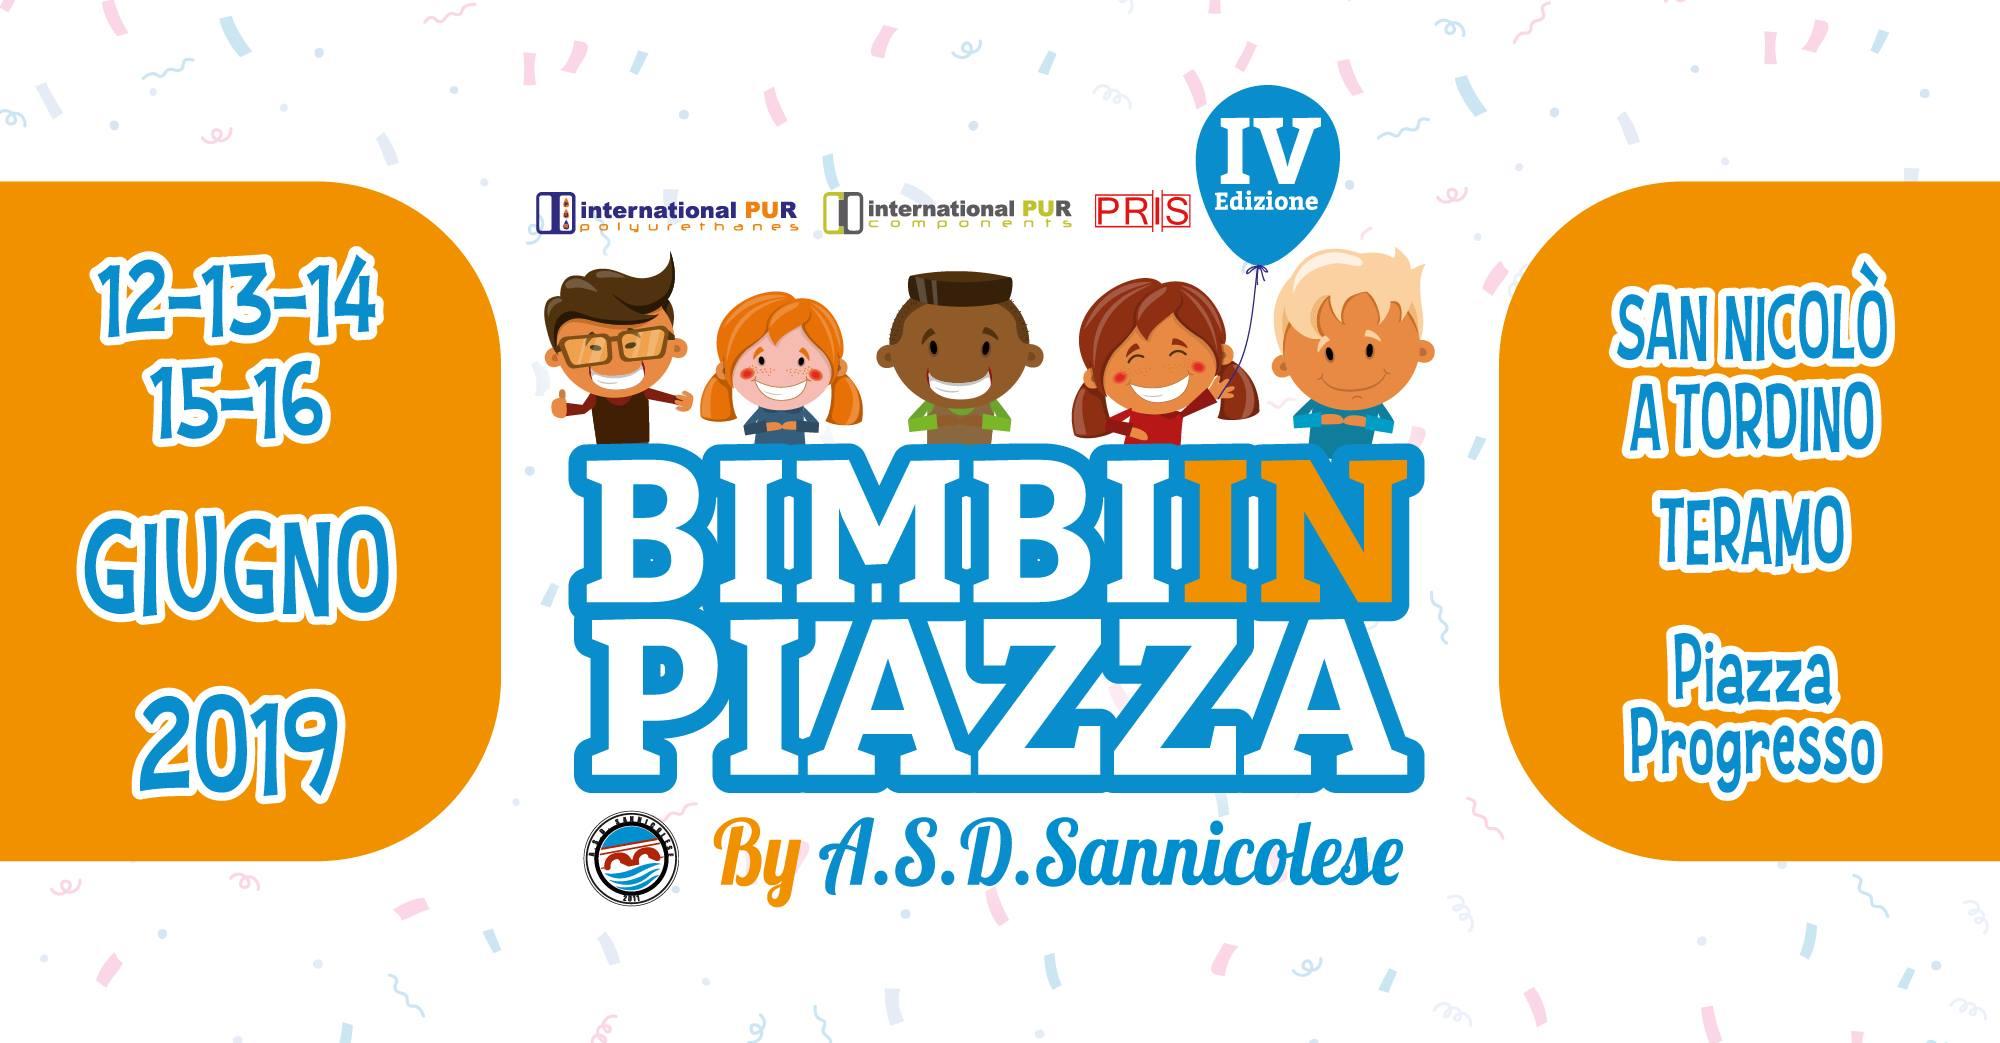 San Nicolò a  Tordino - Bimbi in Piazza dal 12 al 16 Giugno 2019